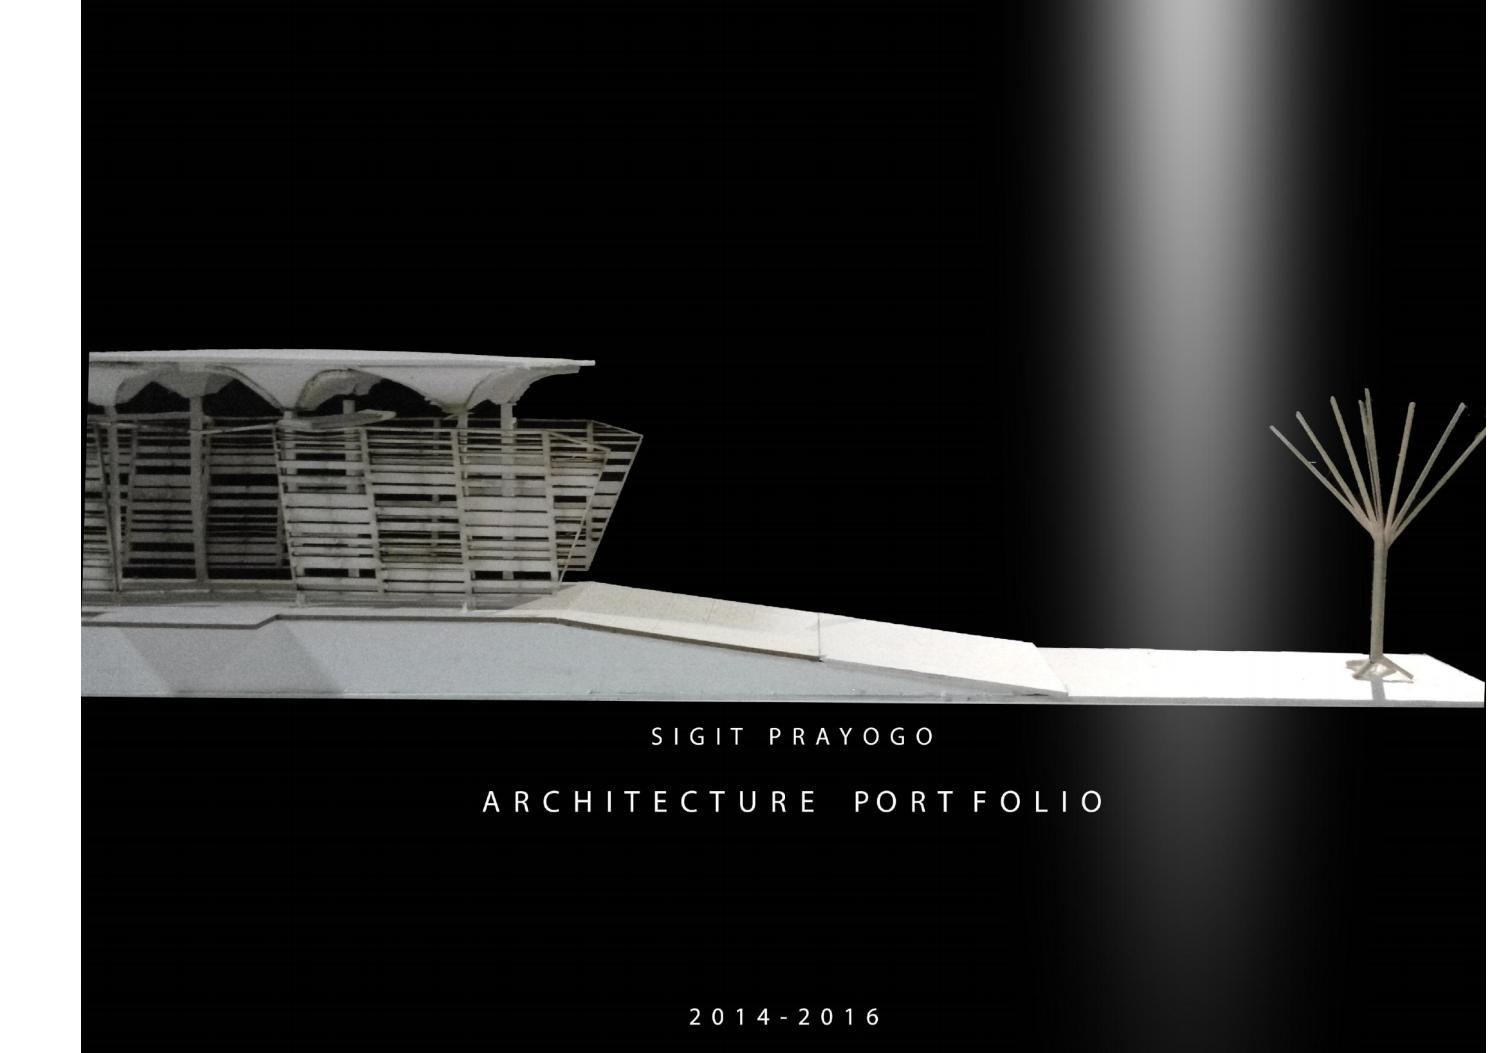 Sigit Prayogo Architecture Portfolio Internship By Sigit